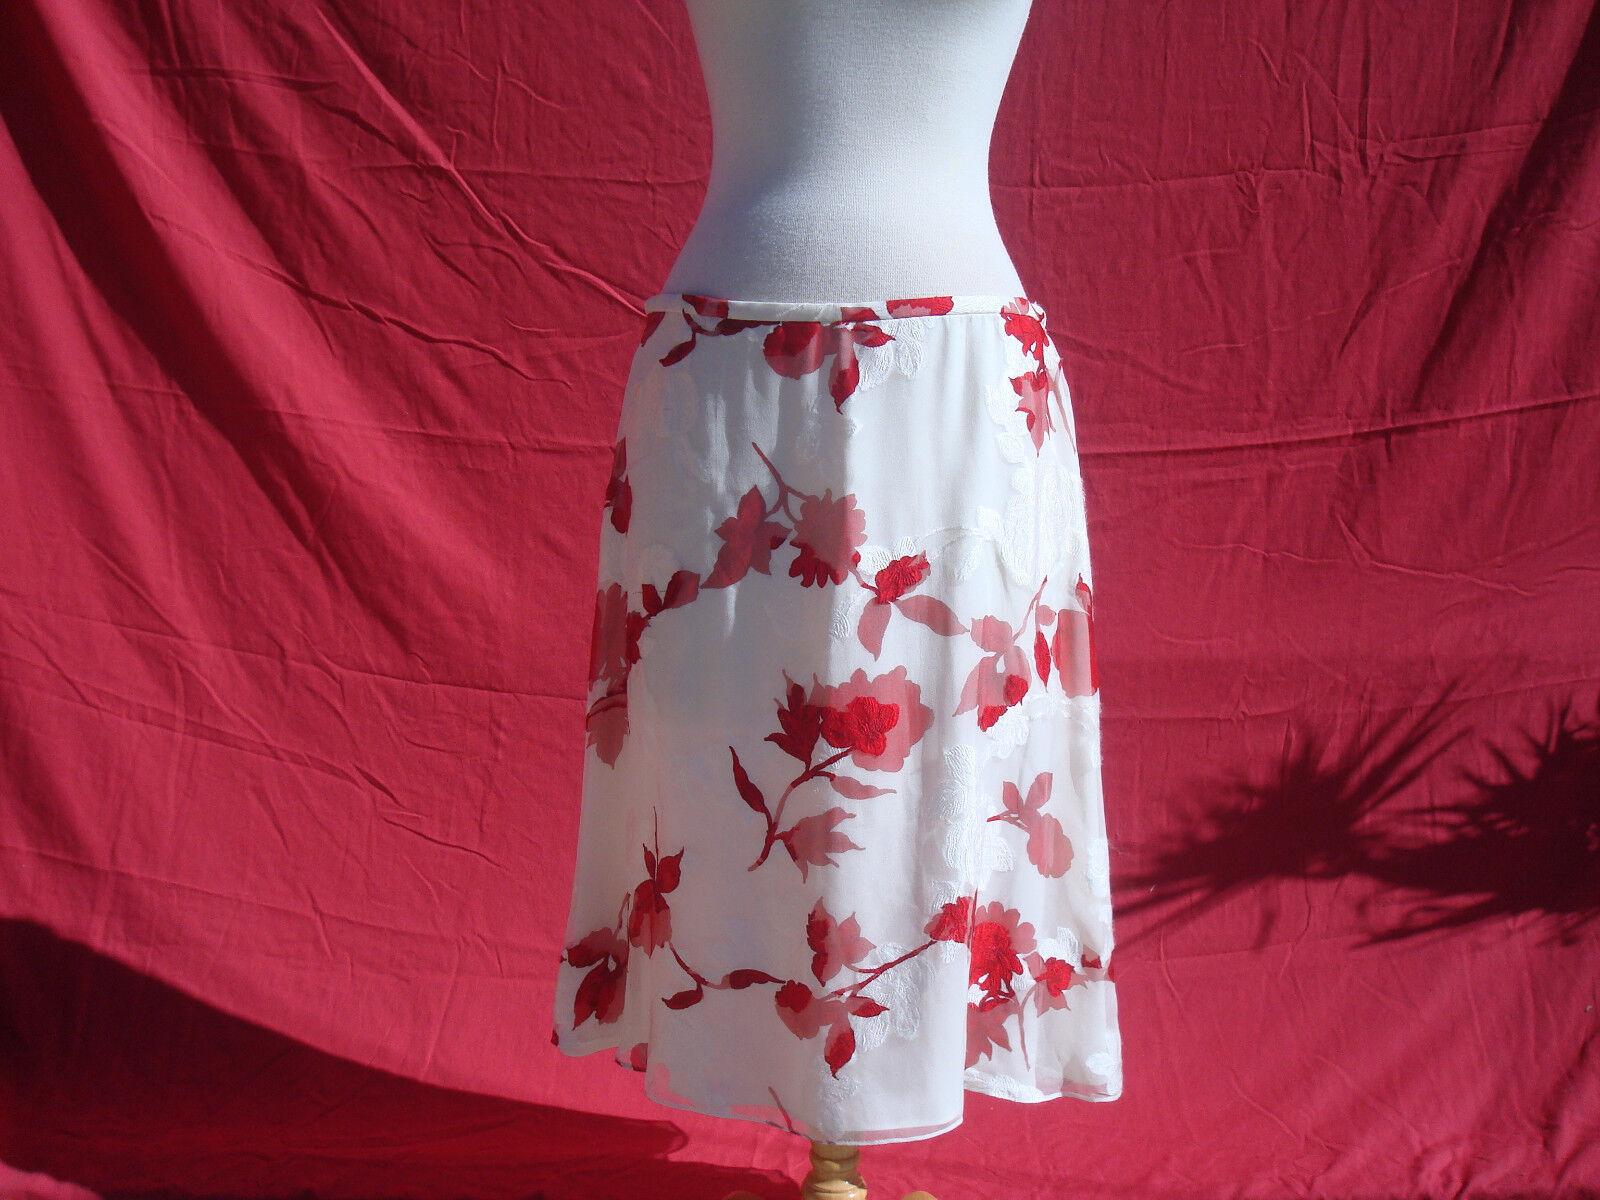 NWT Escada Silk Viscose Ivory White Red Floral Women's Skirt Sz 44 Germany  1100